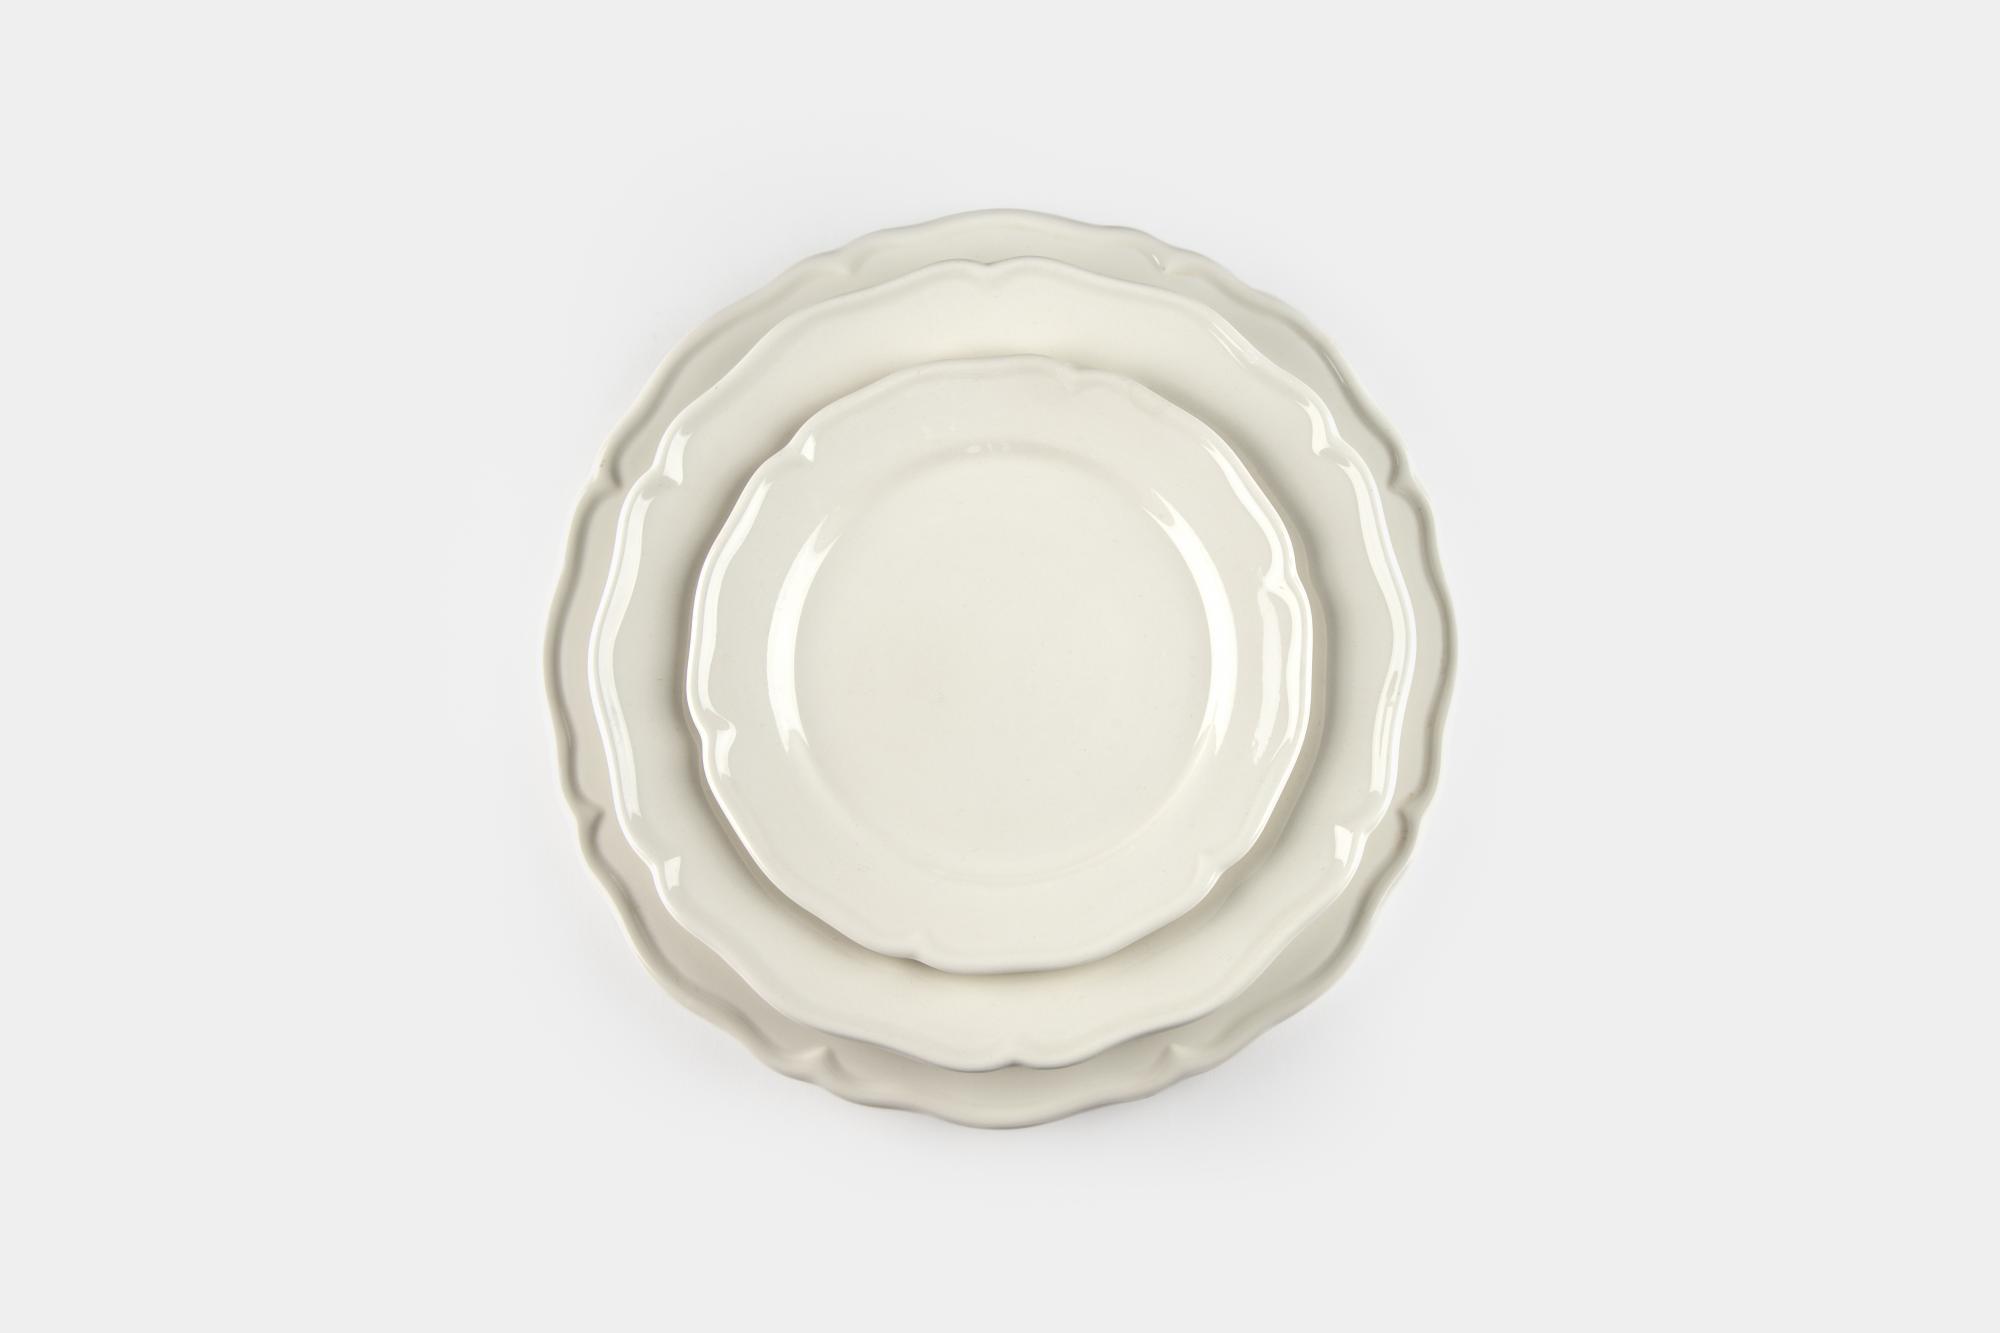 Bristol plate set - Image 2